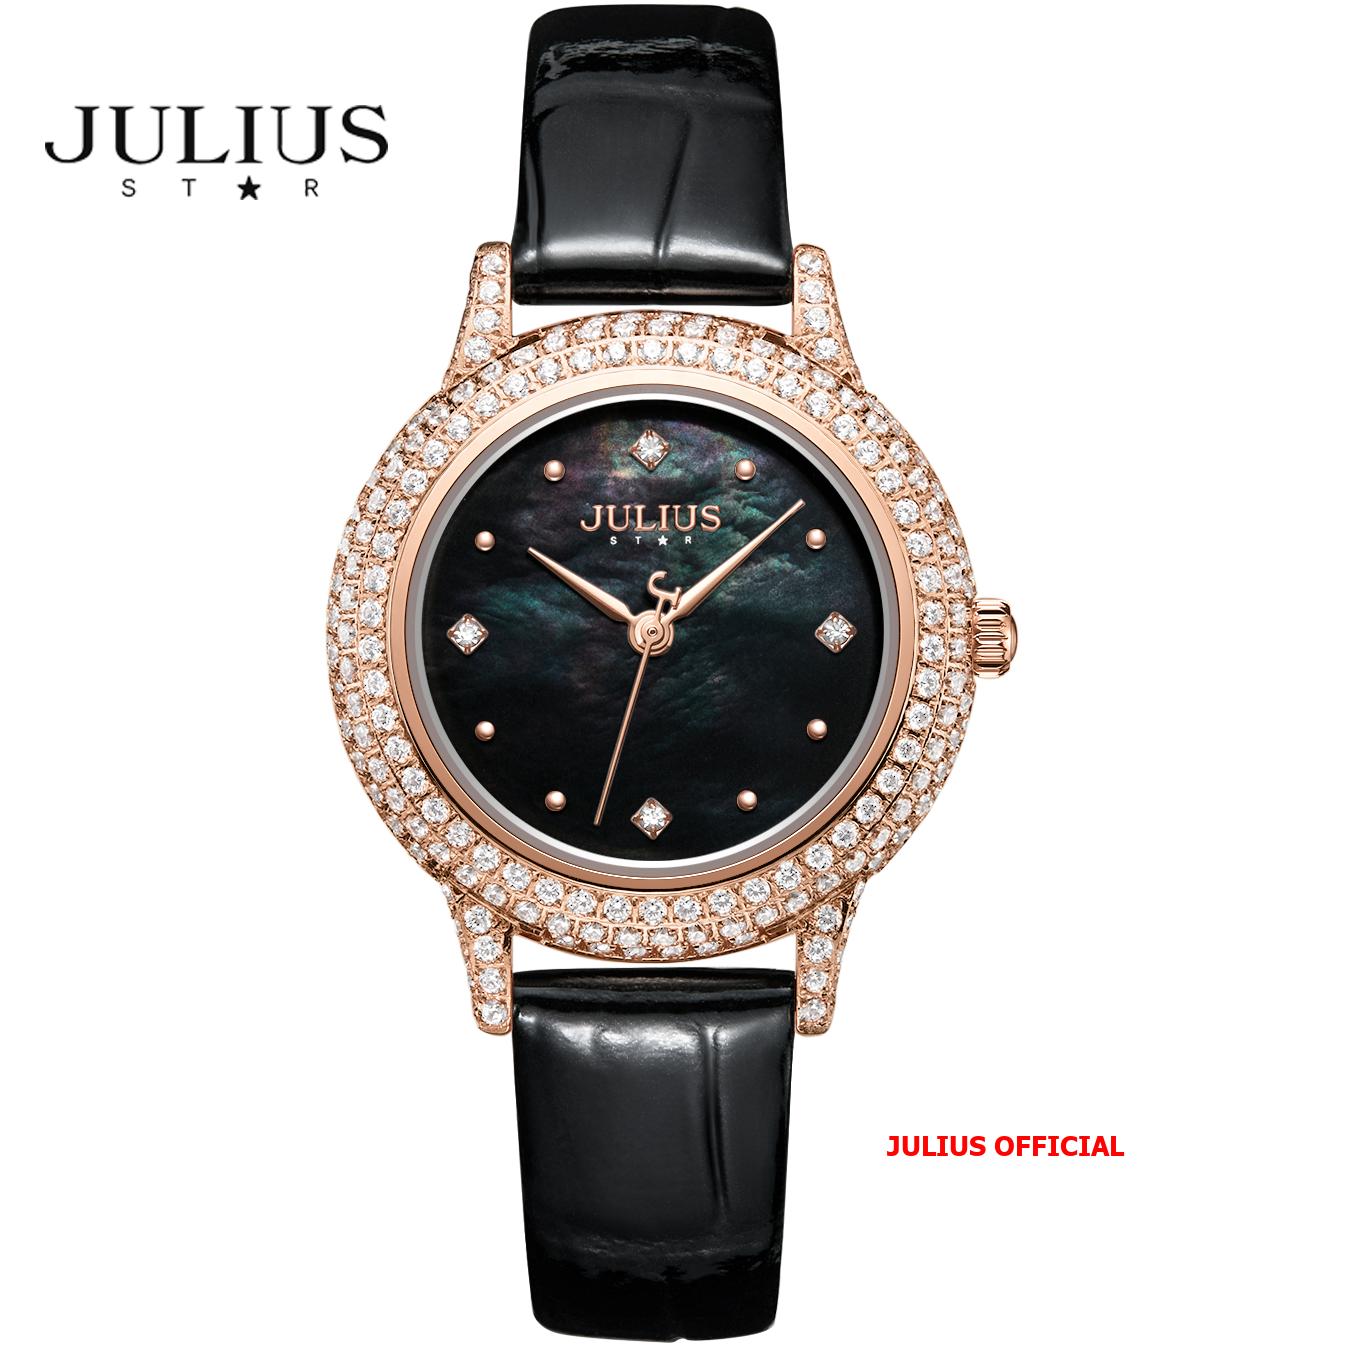 js-044-julius-official-4